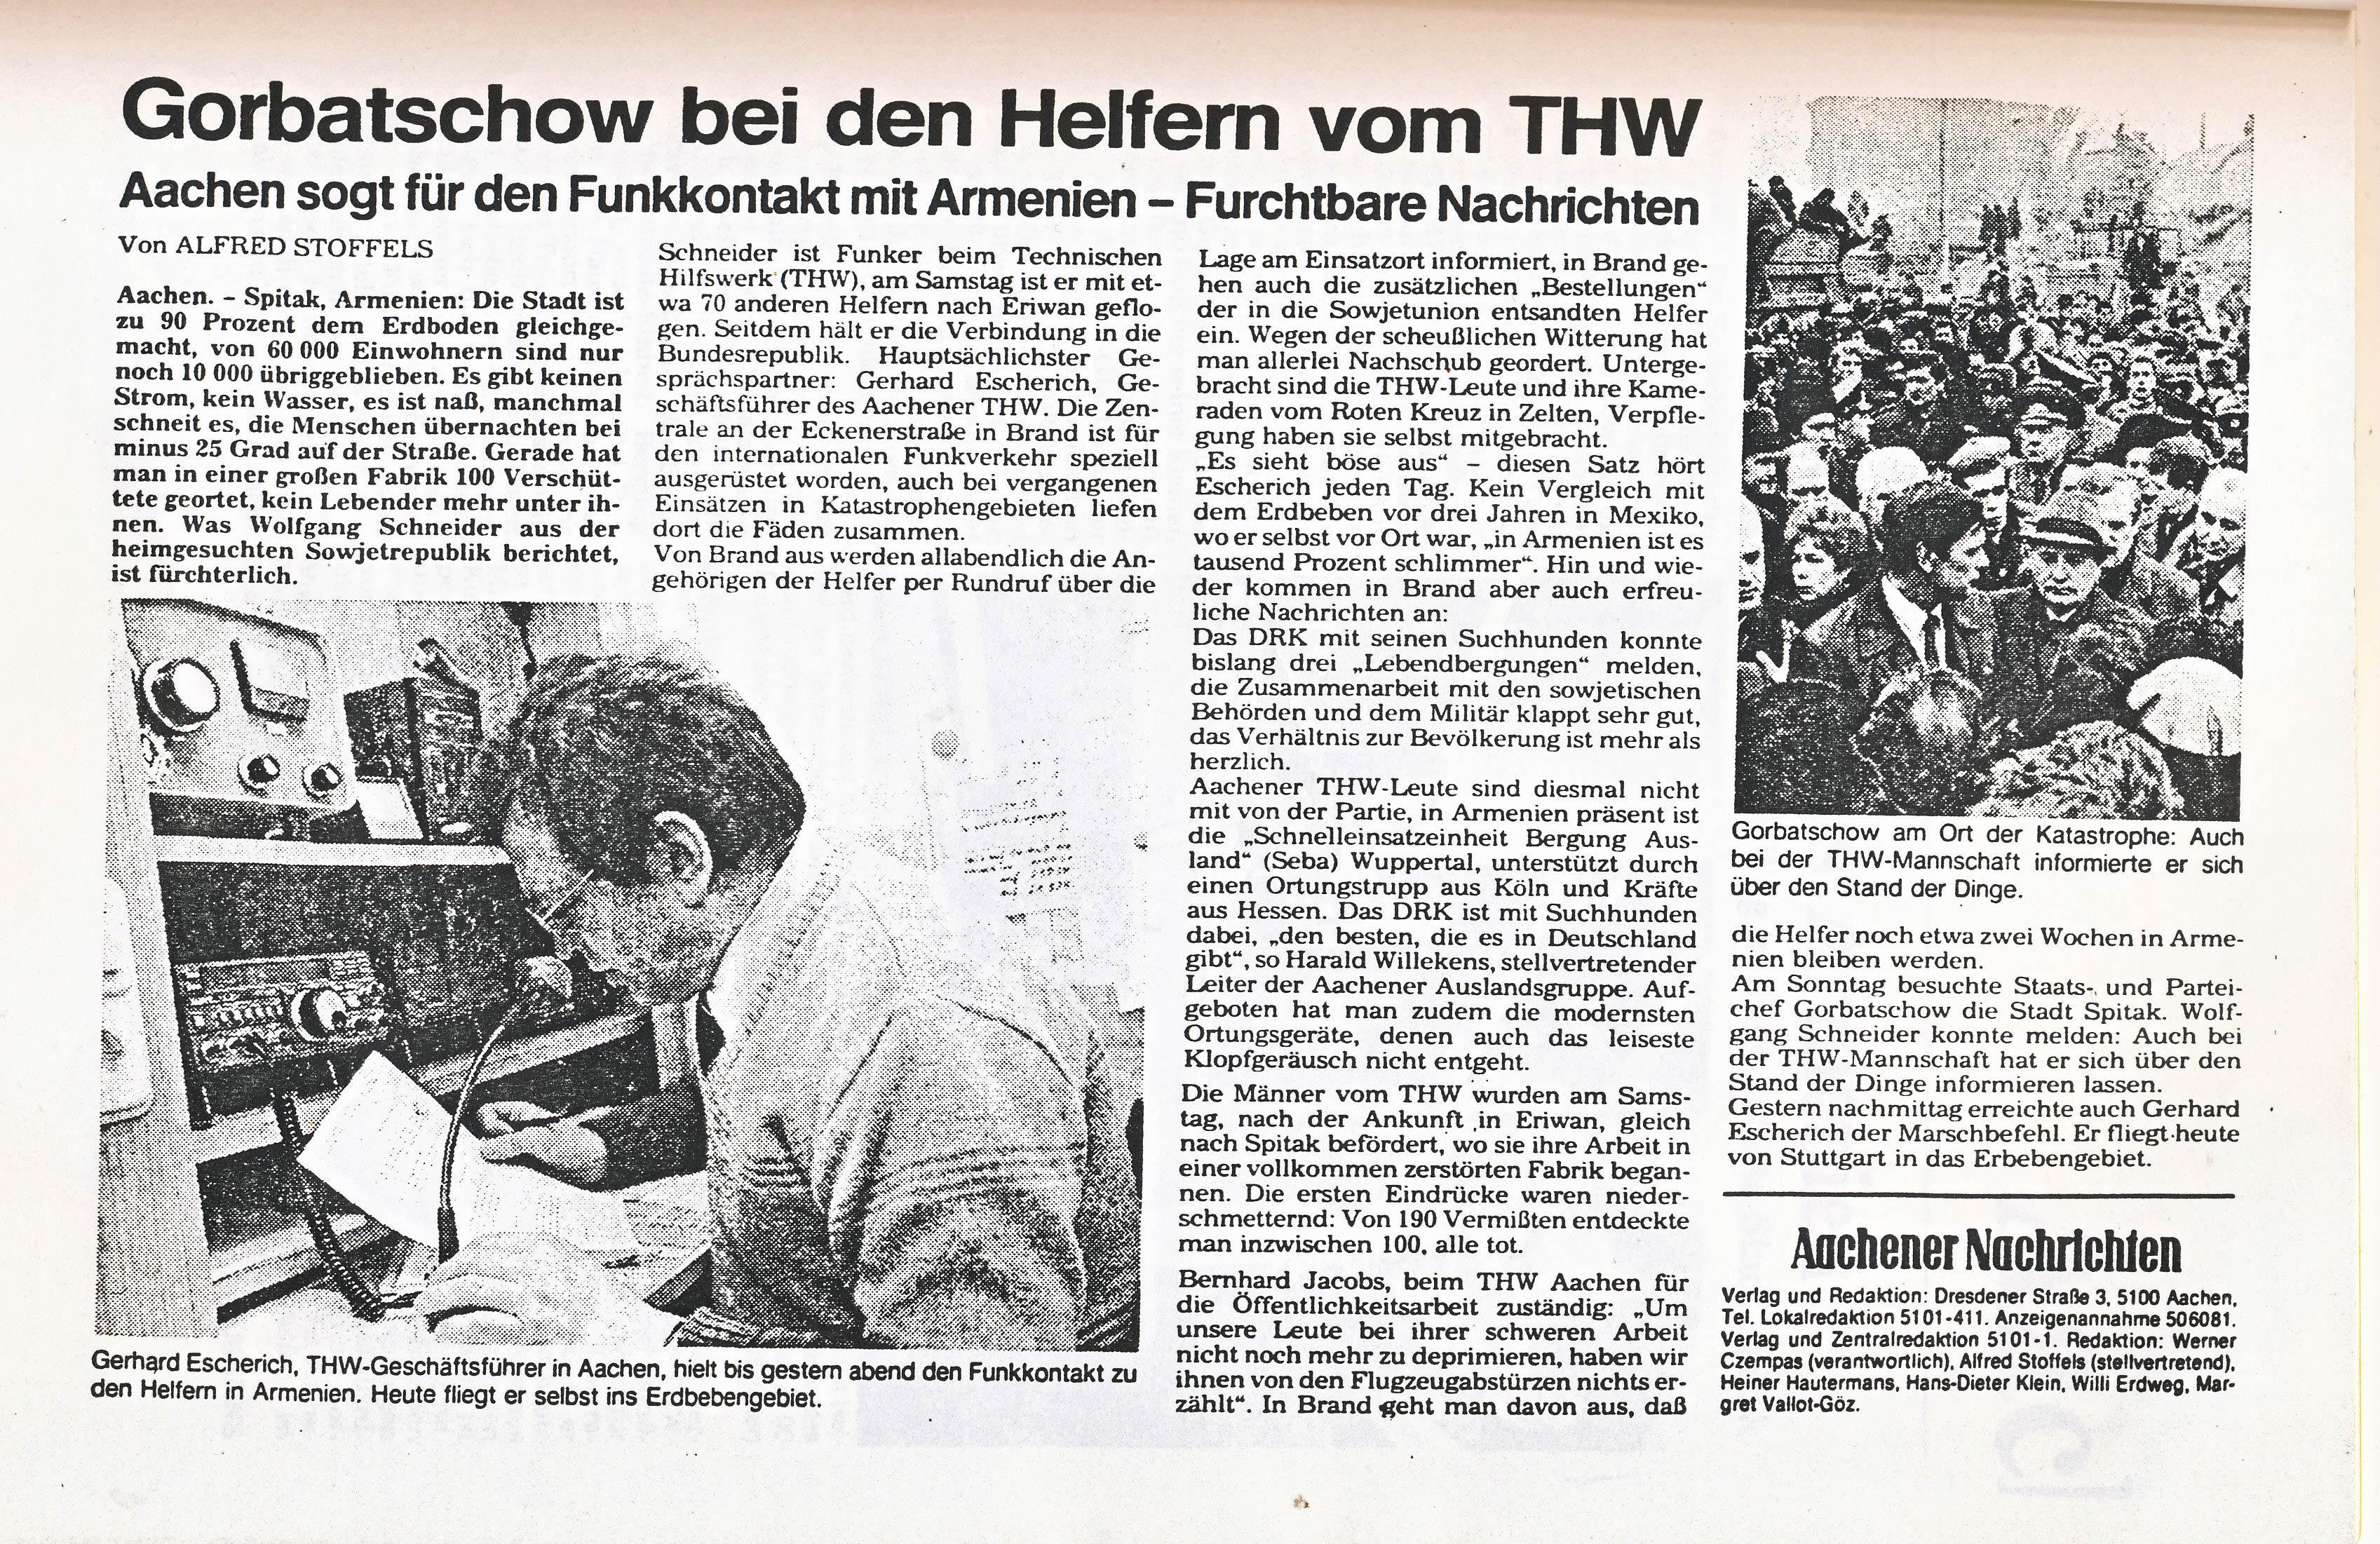 Нажмите на изображение для увеличения.  Название:THW-Brochure-in-German_0014.jpg Просмотров:1 Размер:1.91 Мб ID:228287